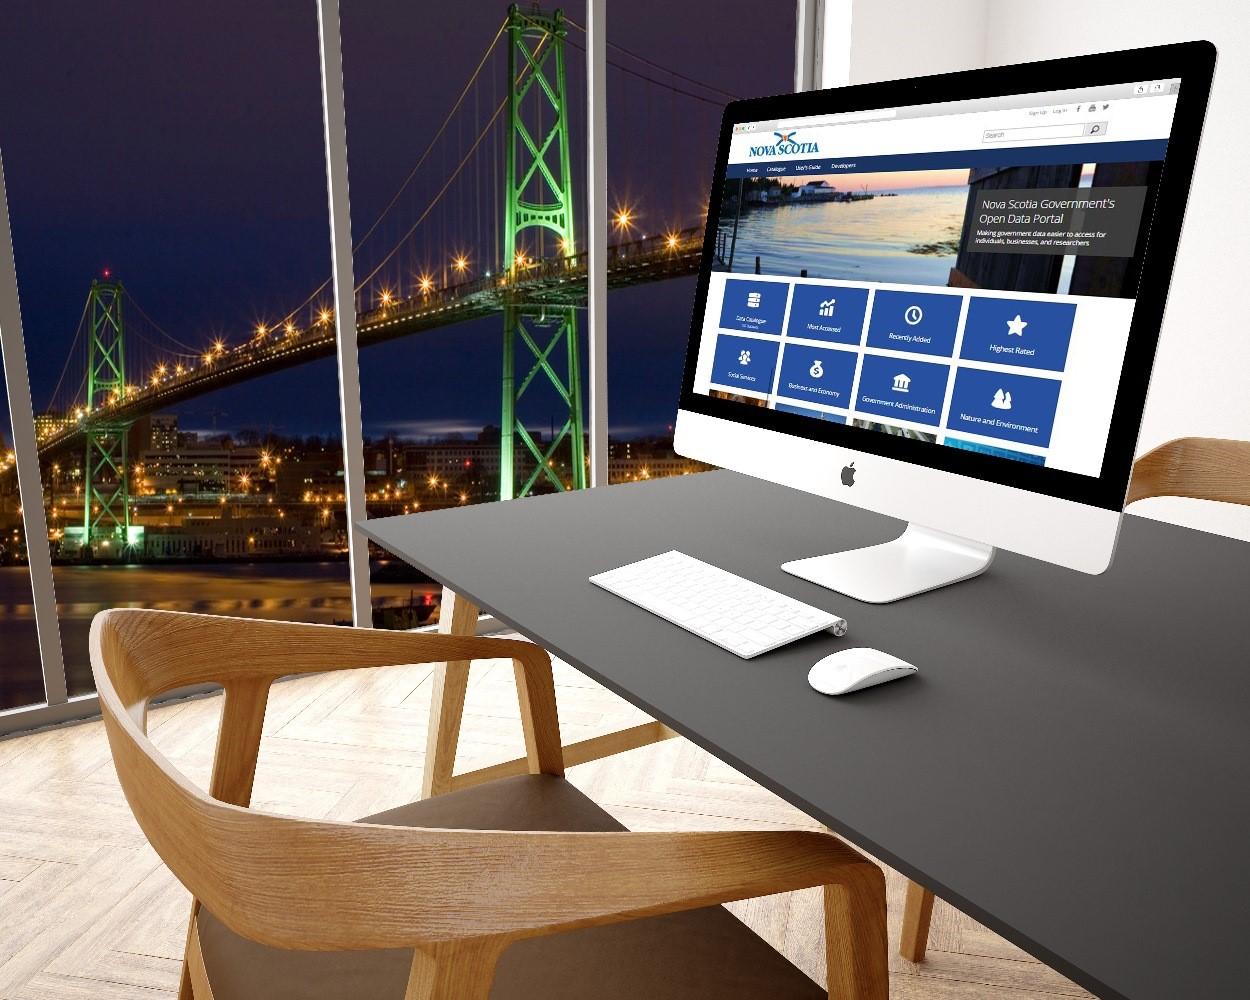 Nova Scotia Open Data Portal